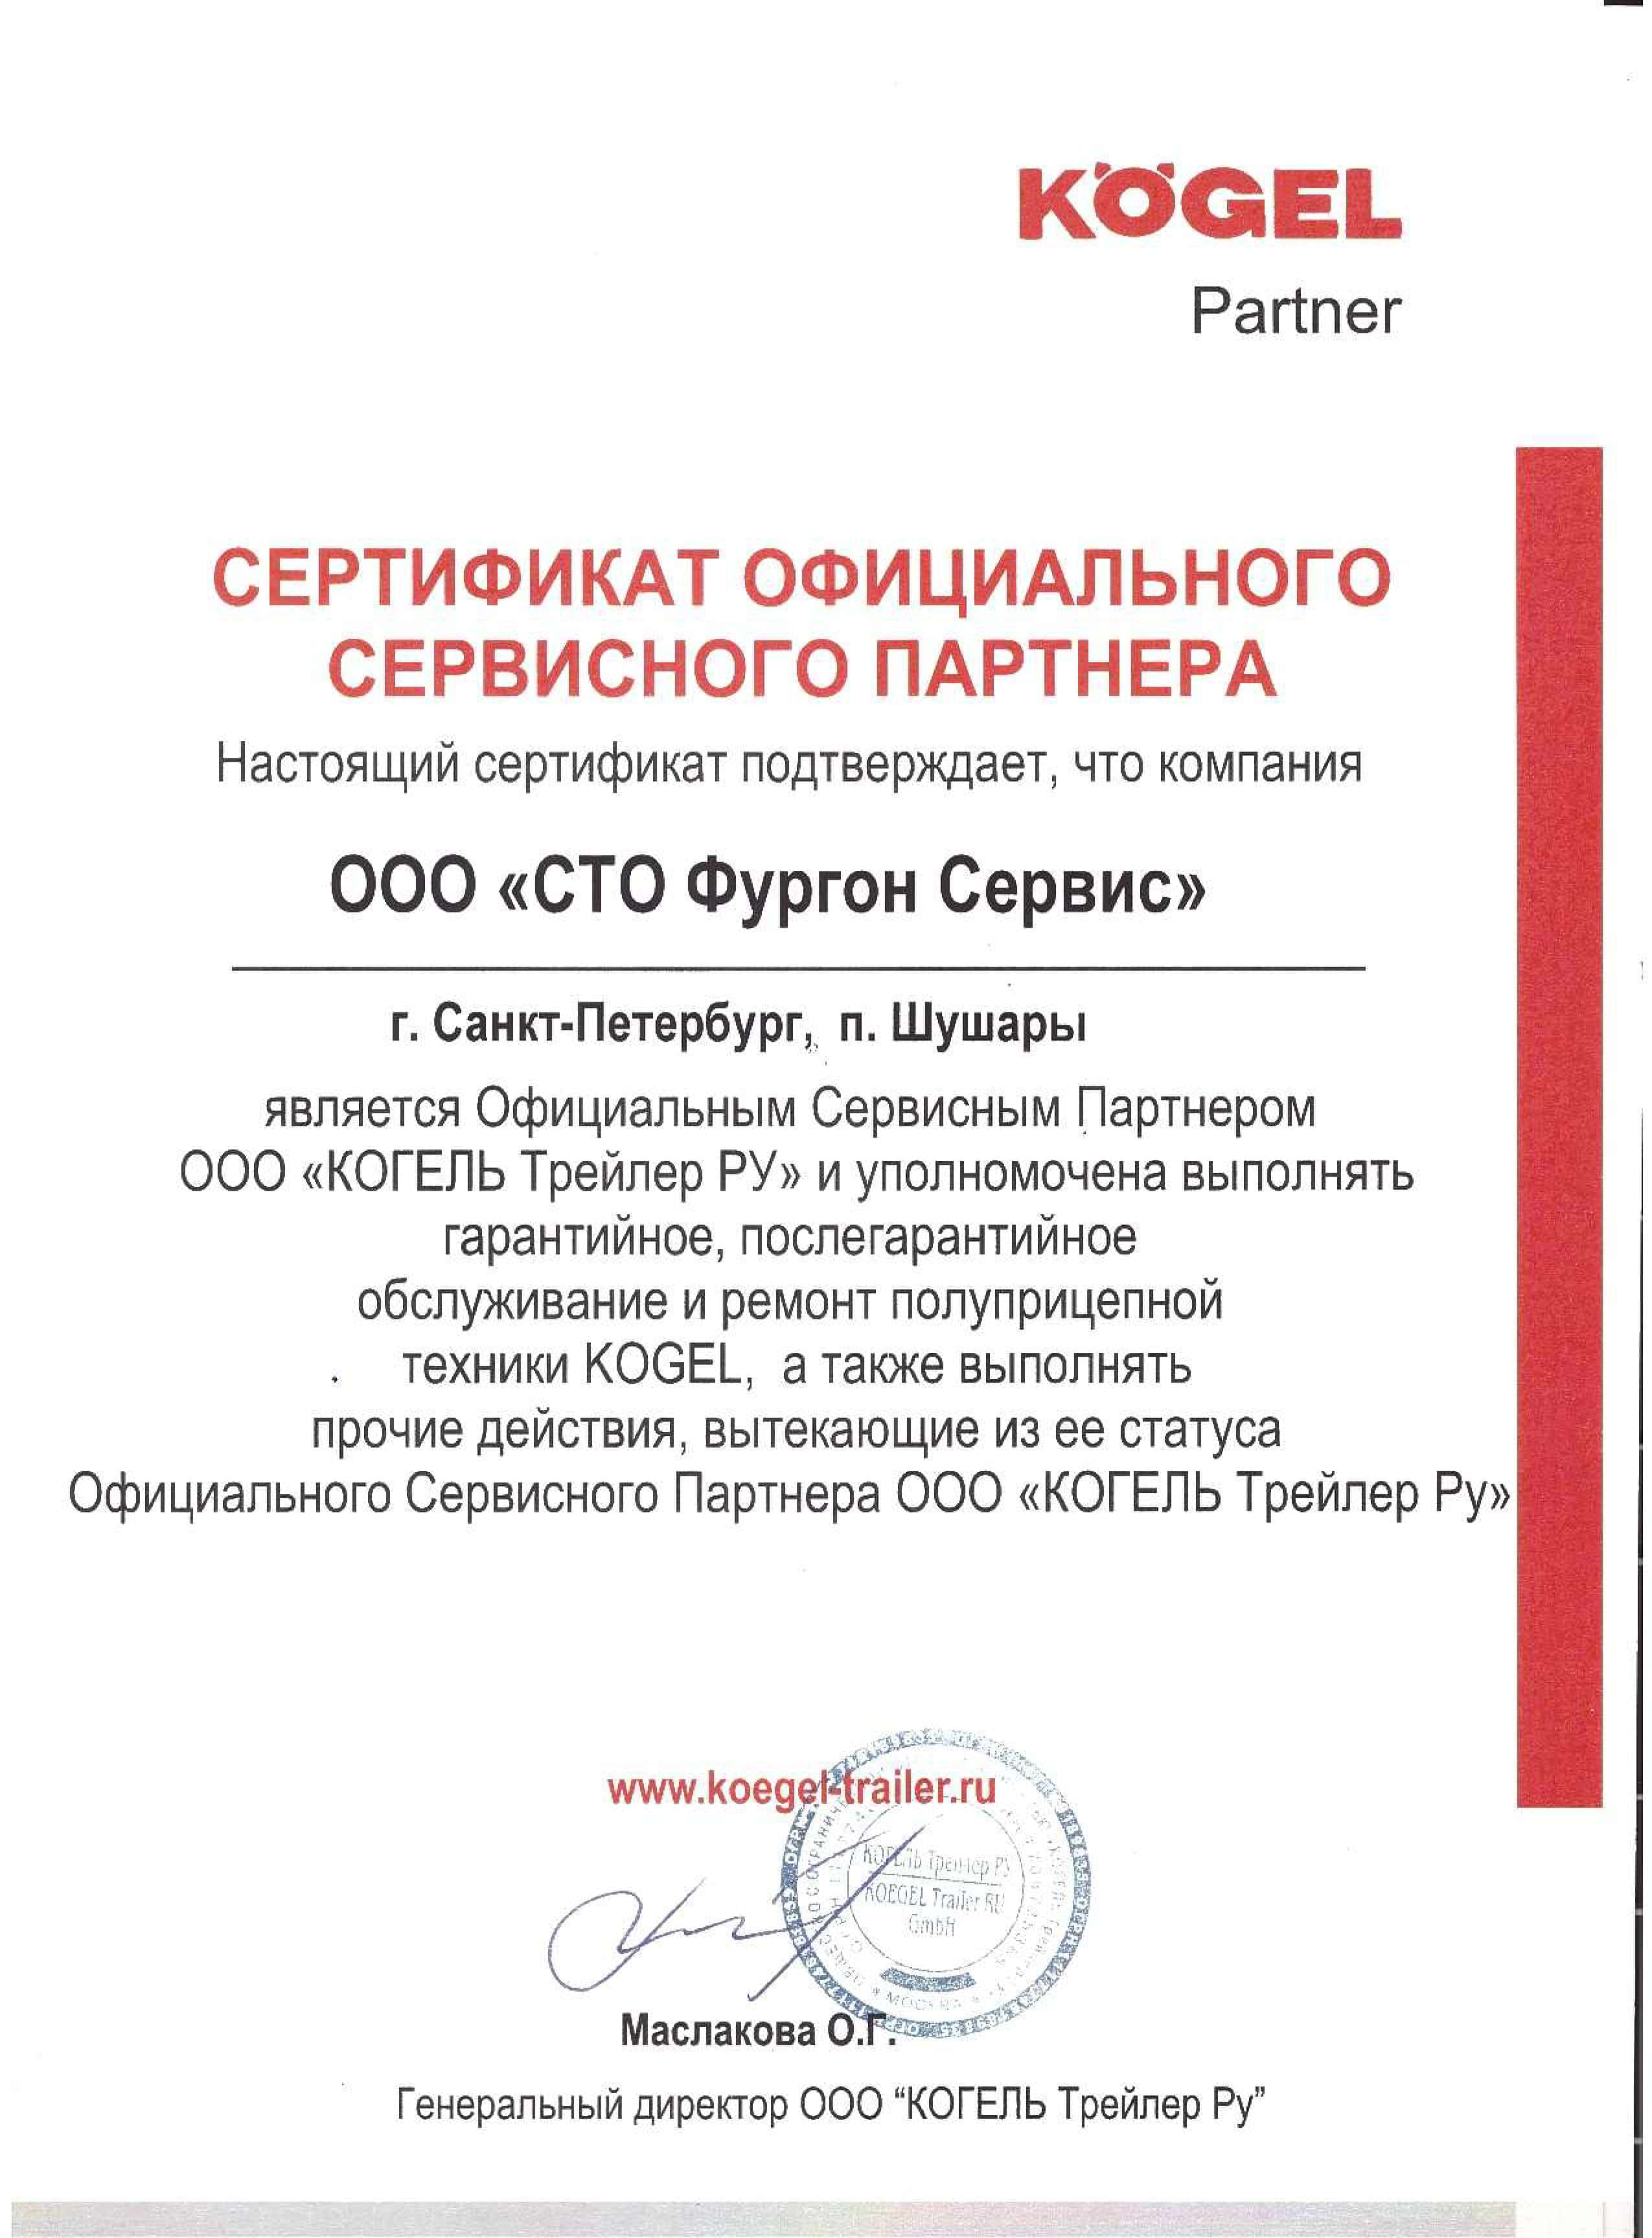 oficialnie_partneri_obslyjivanie_i_remont_furgonov_kogel